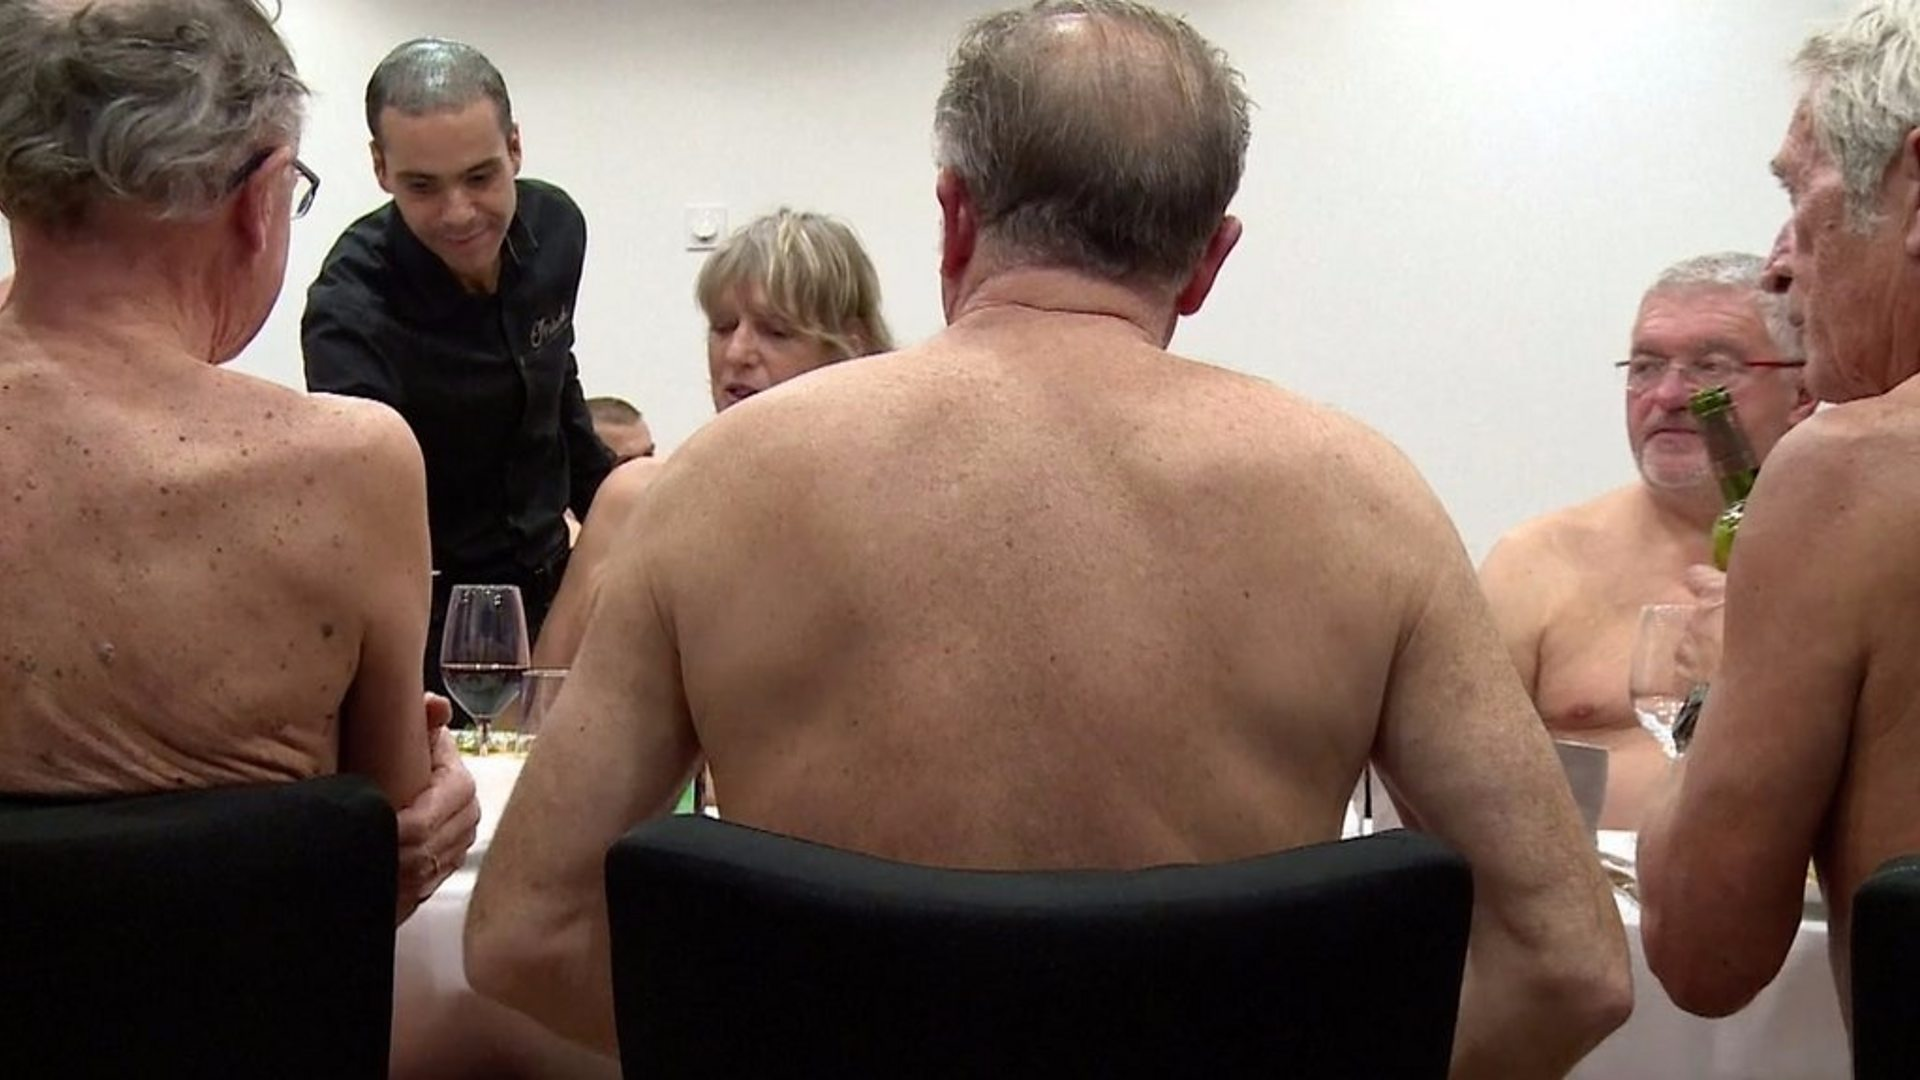 Nude Fotos extreme nudist video